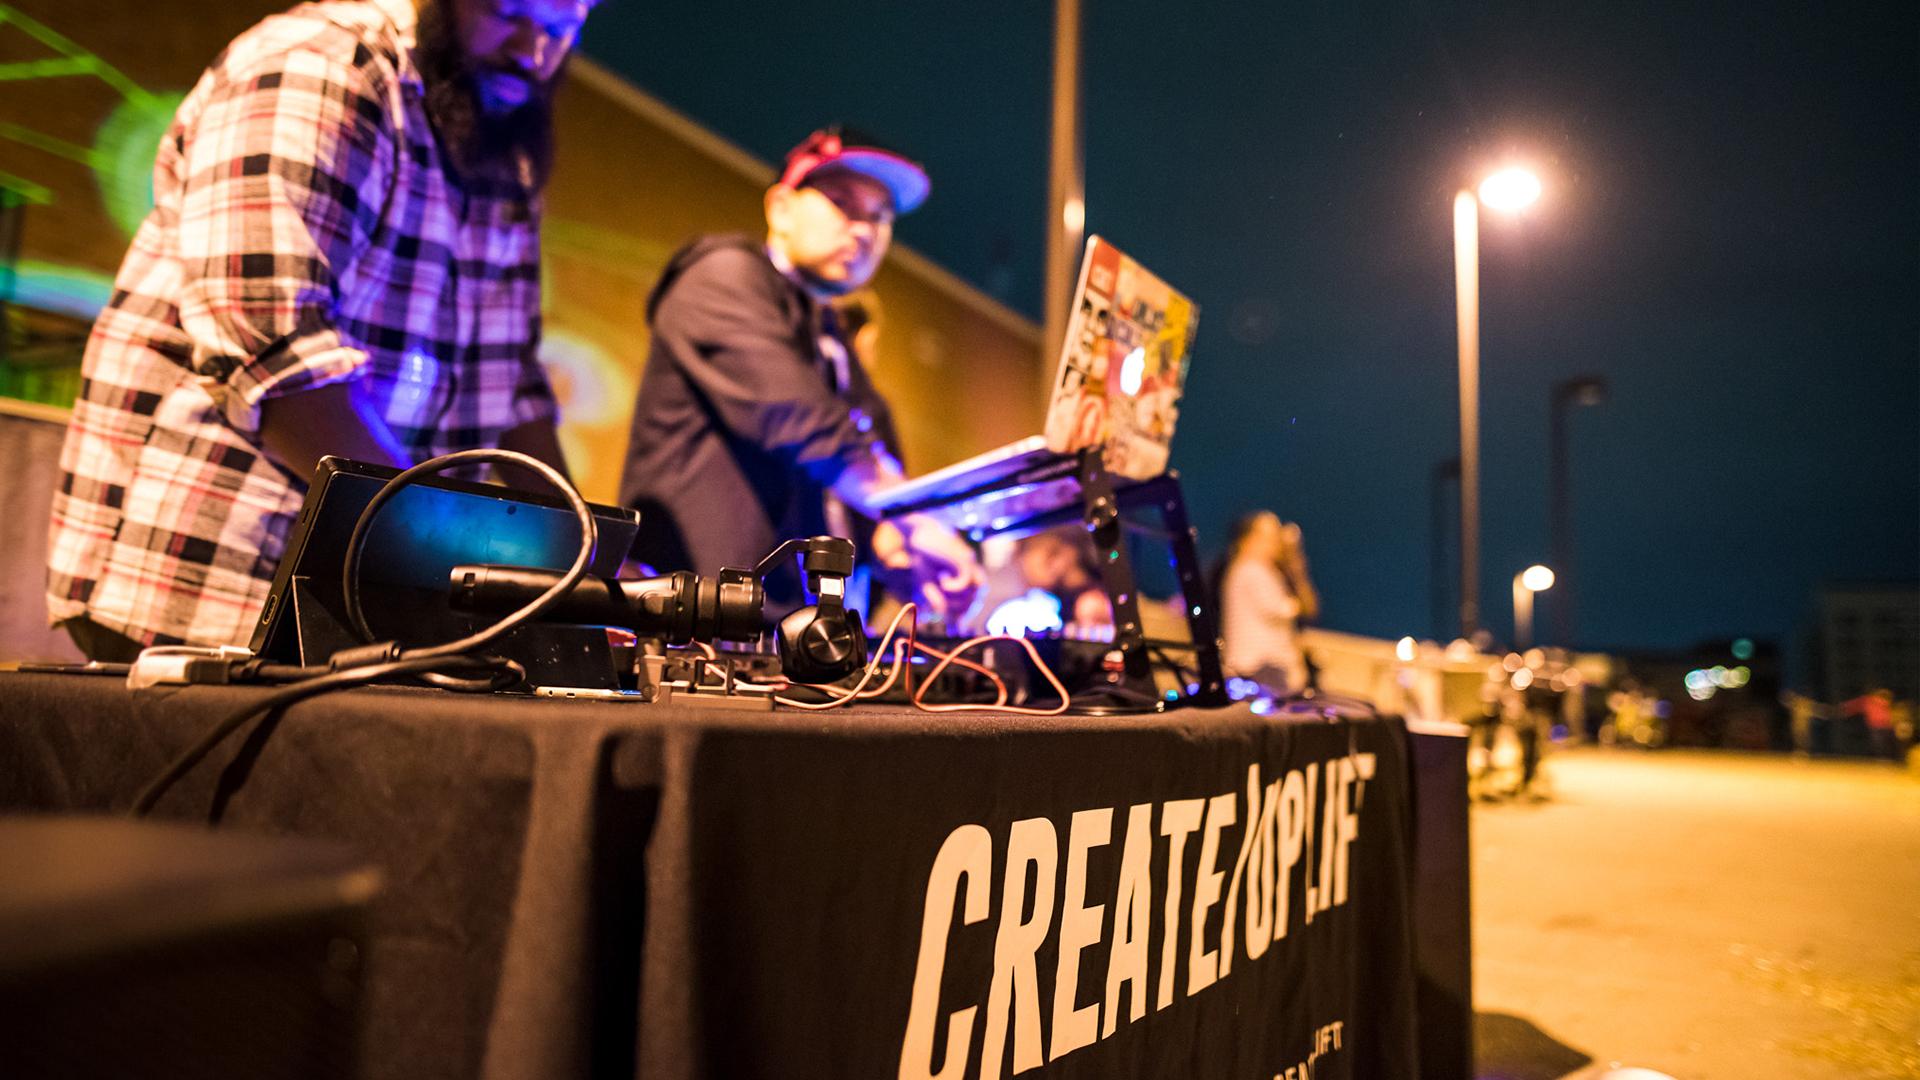 Pro Audio - DJ | Production | Editing | Engineering